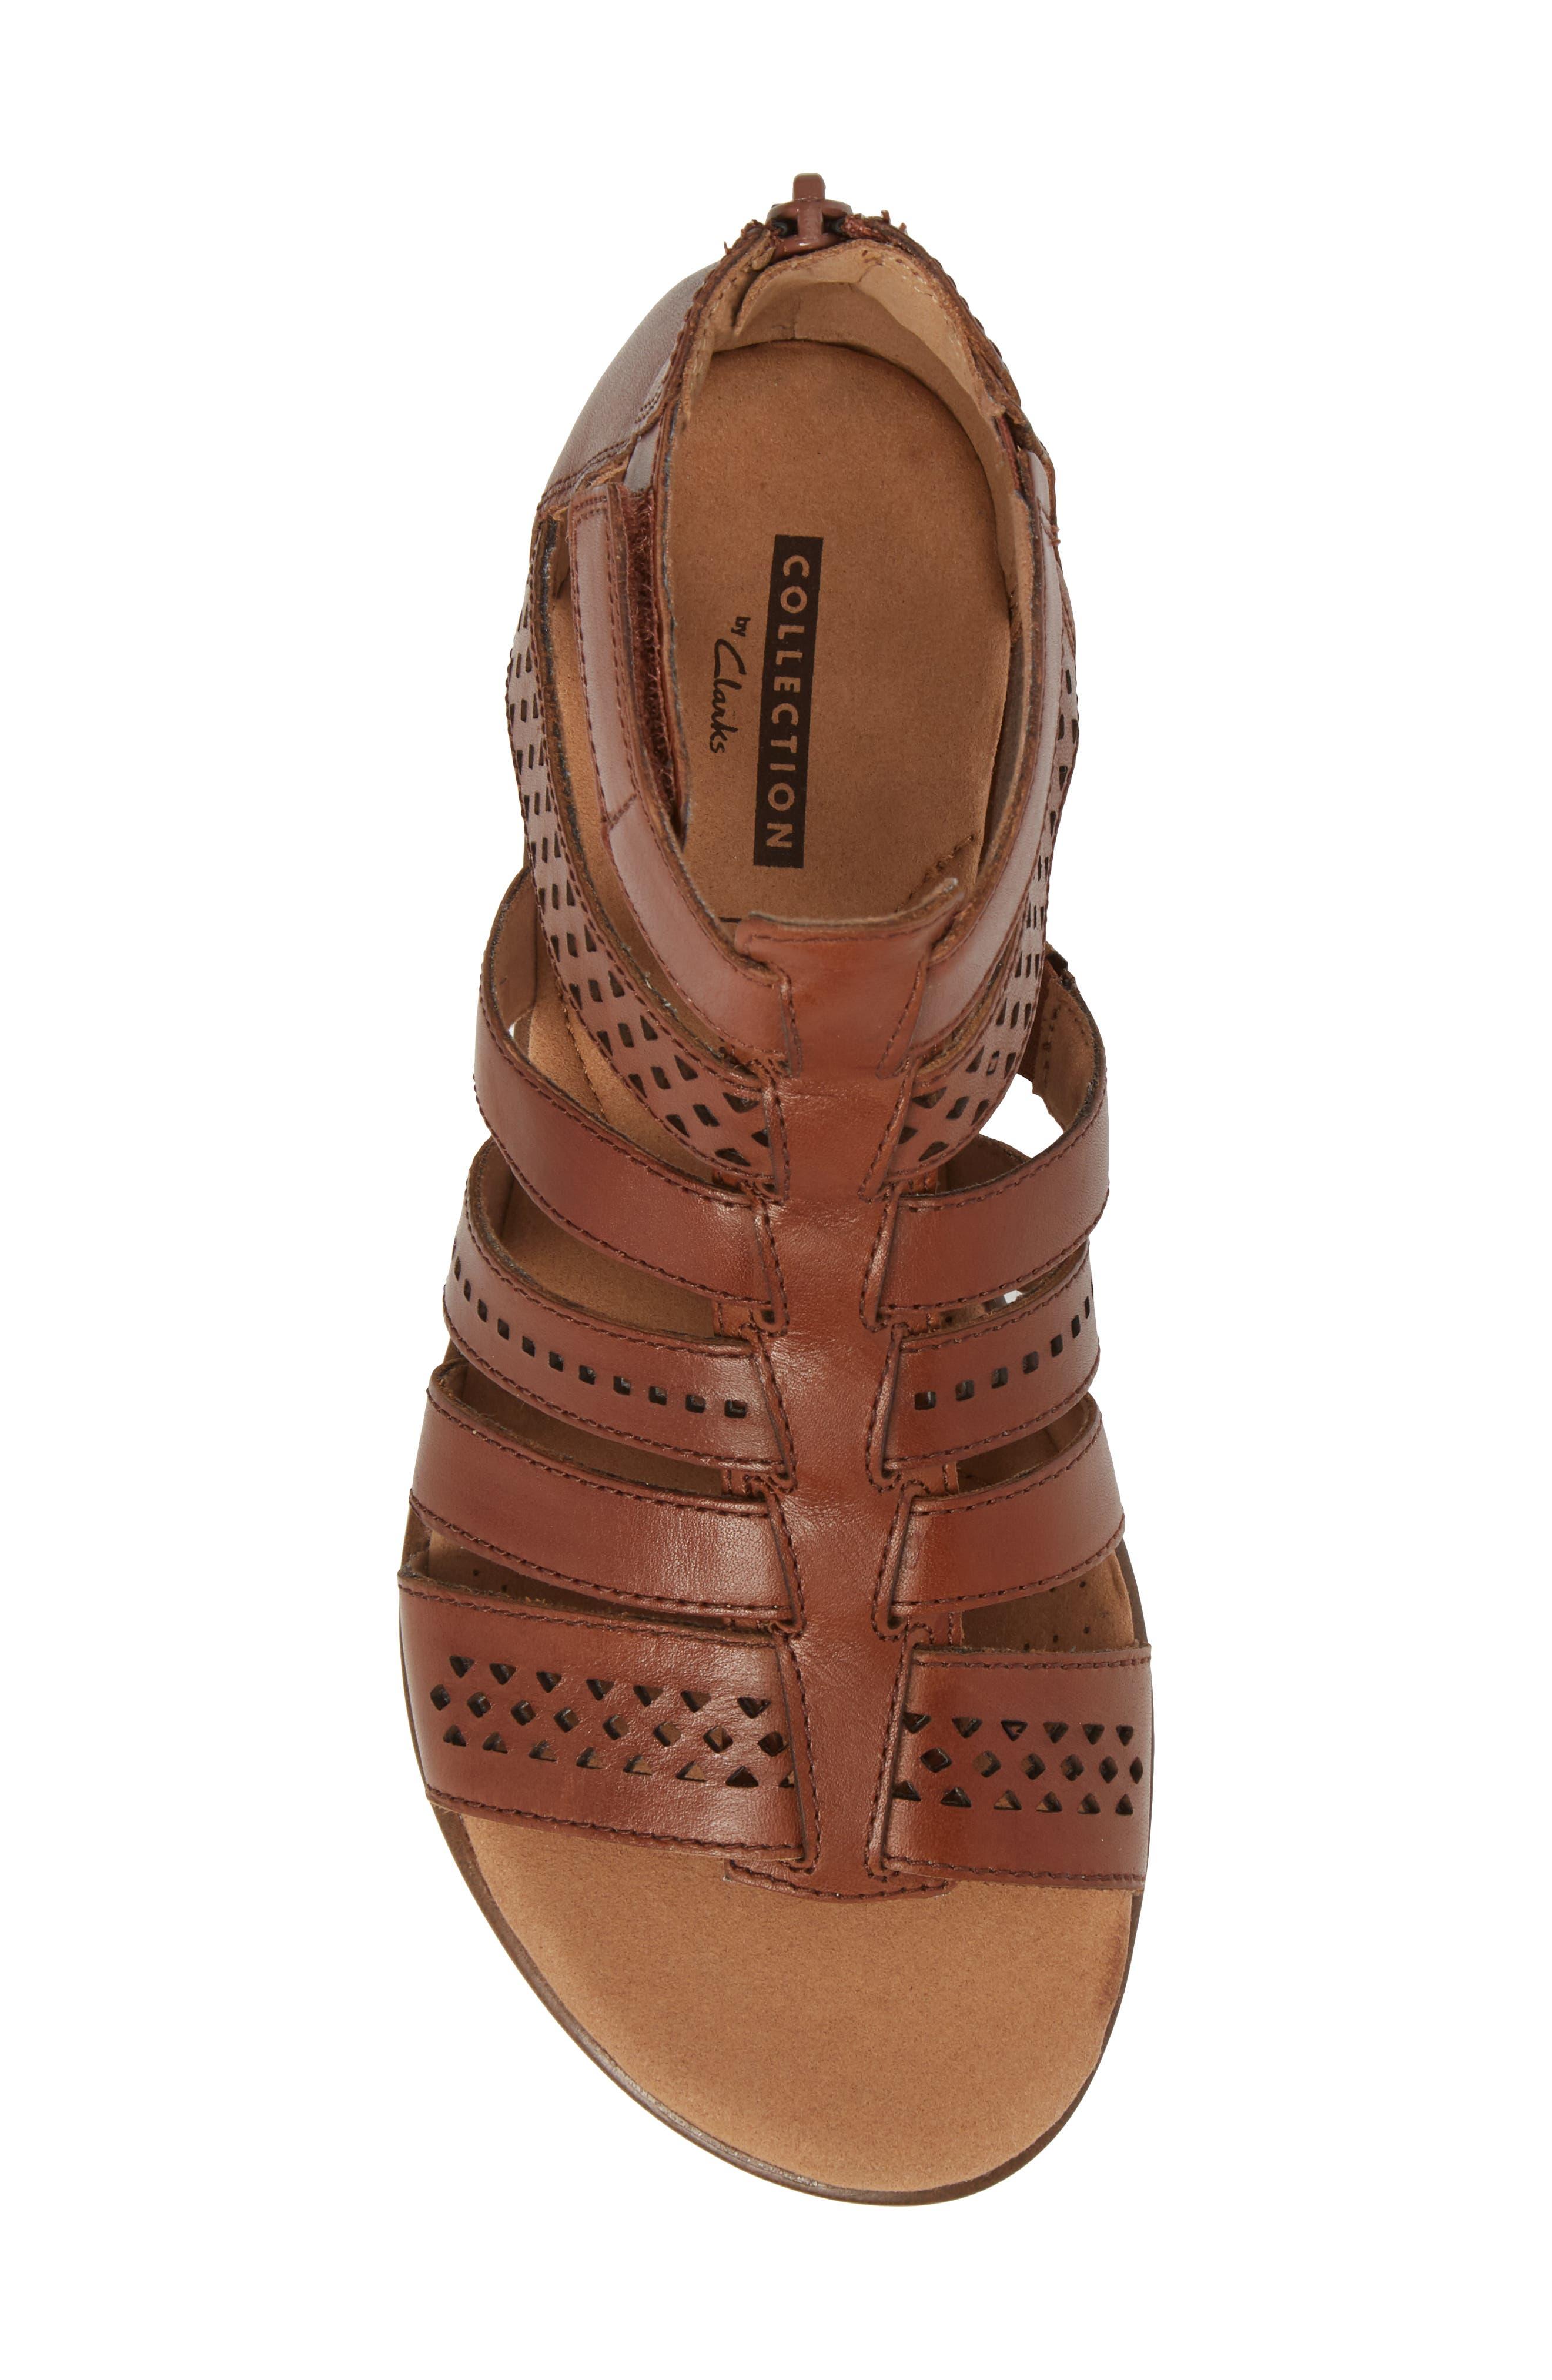 CLARKS<SUP>®</SUP>,                             Kele Lotus Sandal,                             Alternate thumbnail 5, color,                             250